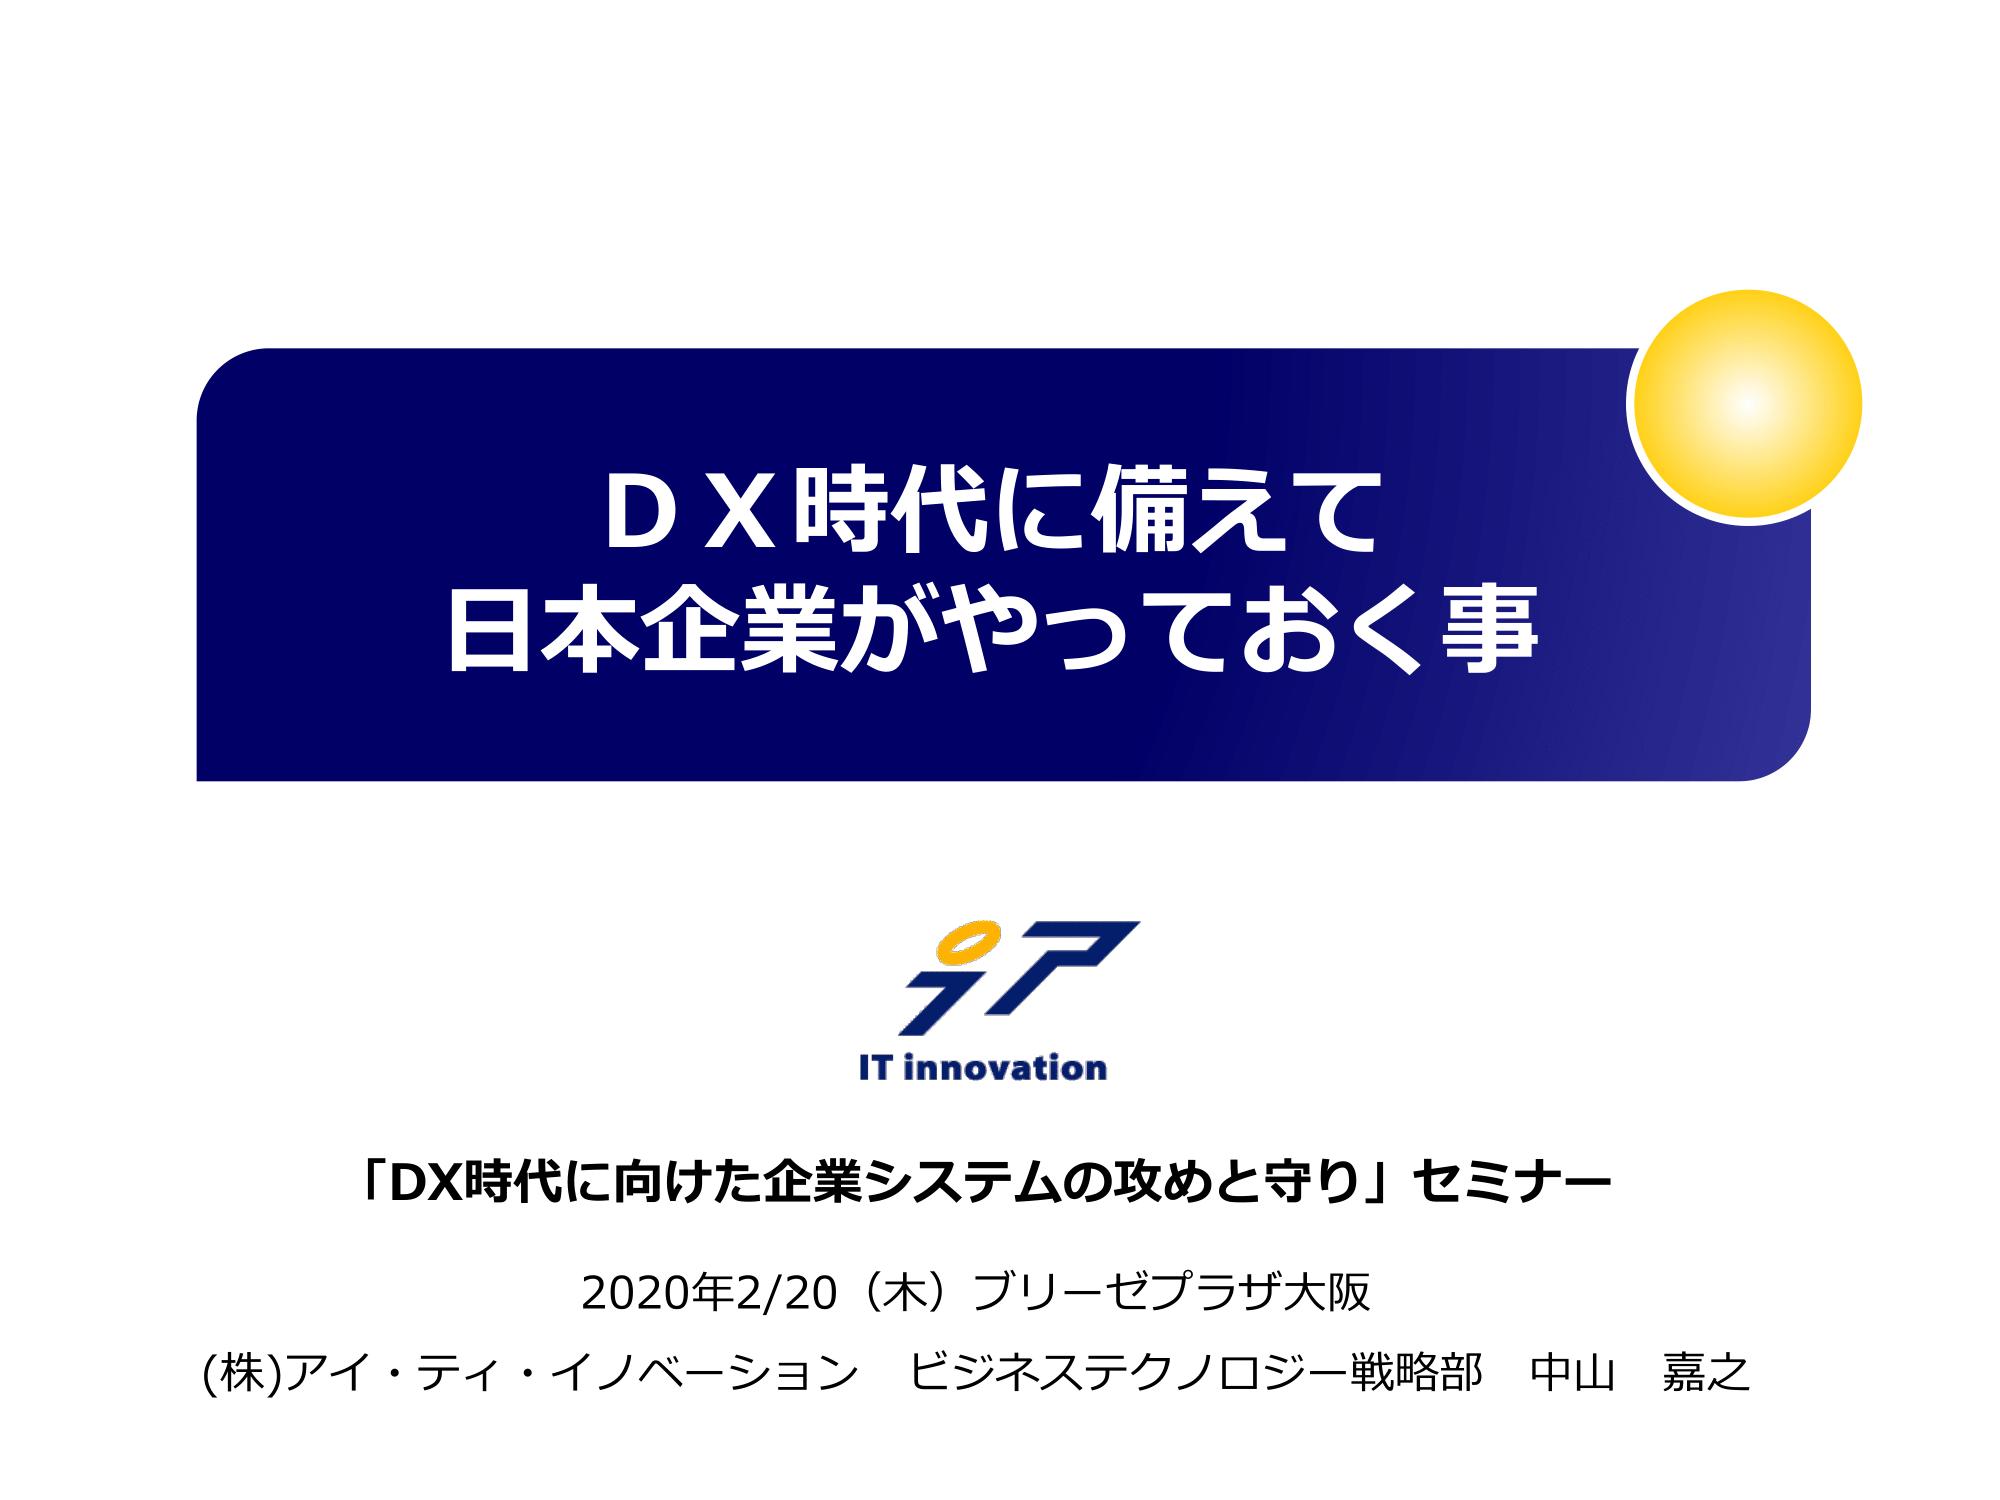 DX:DX時代に備えて日本企業がやっておく事